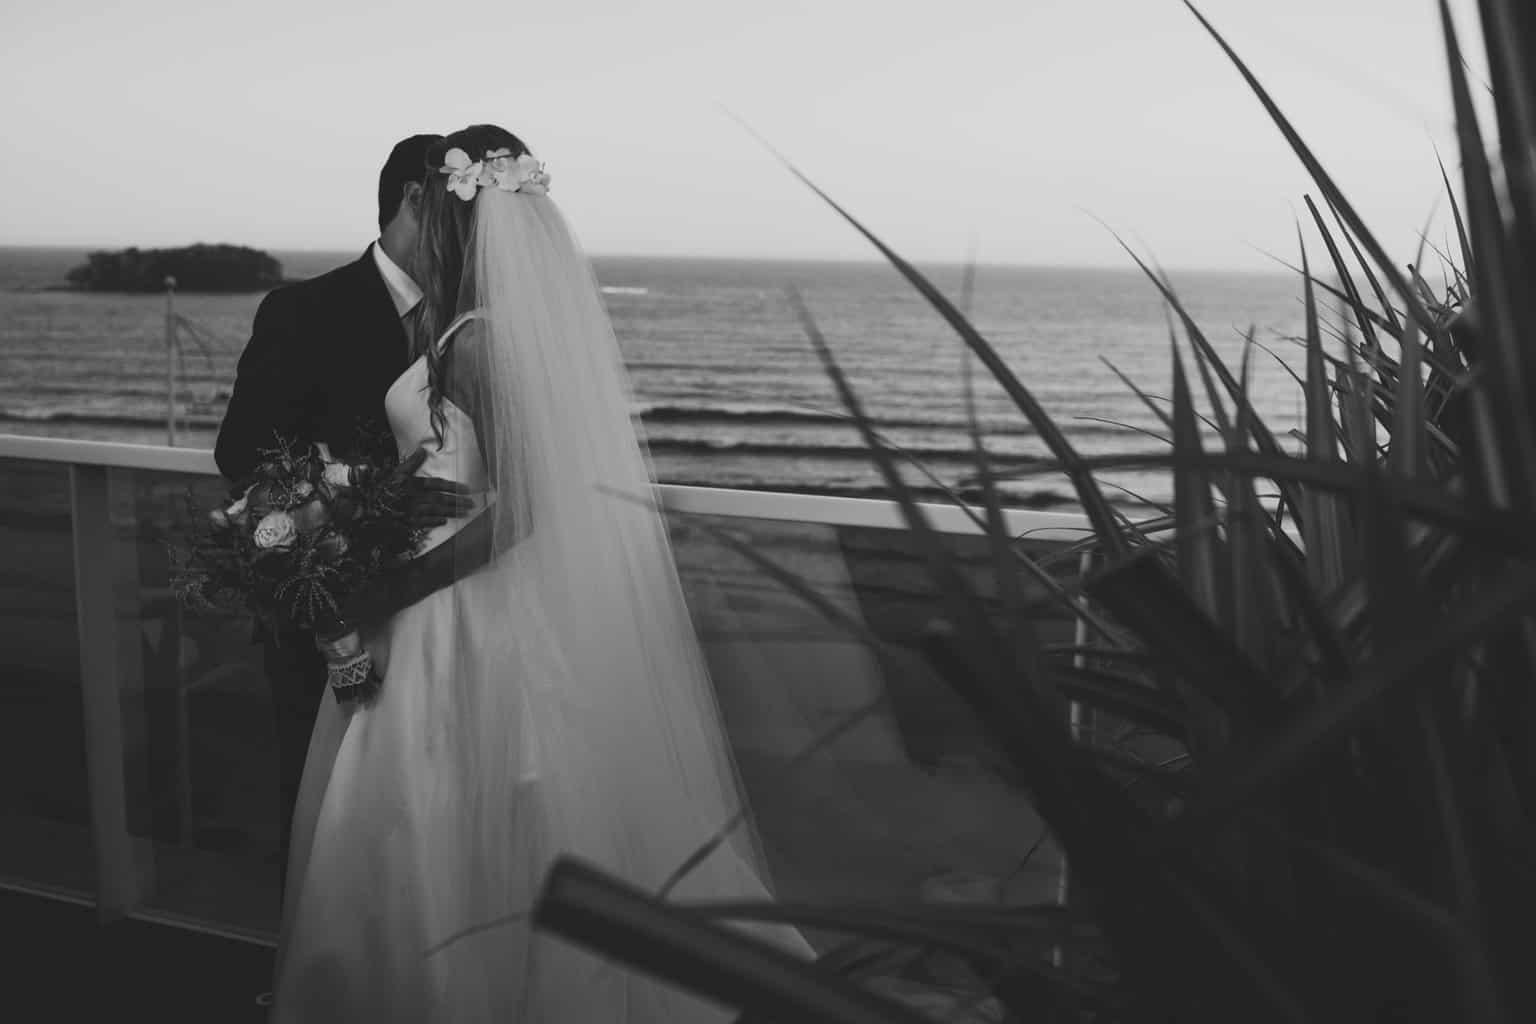 casamento-julia-e-guilherme-caseme-26